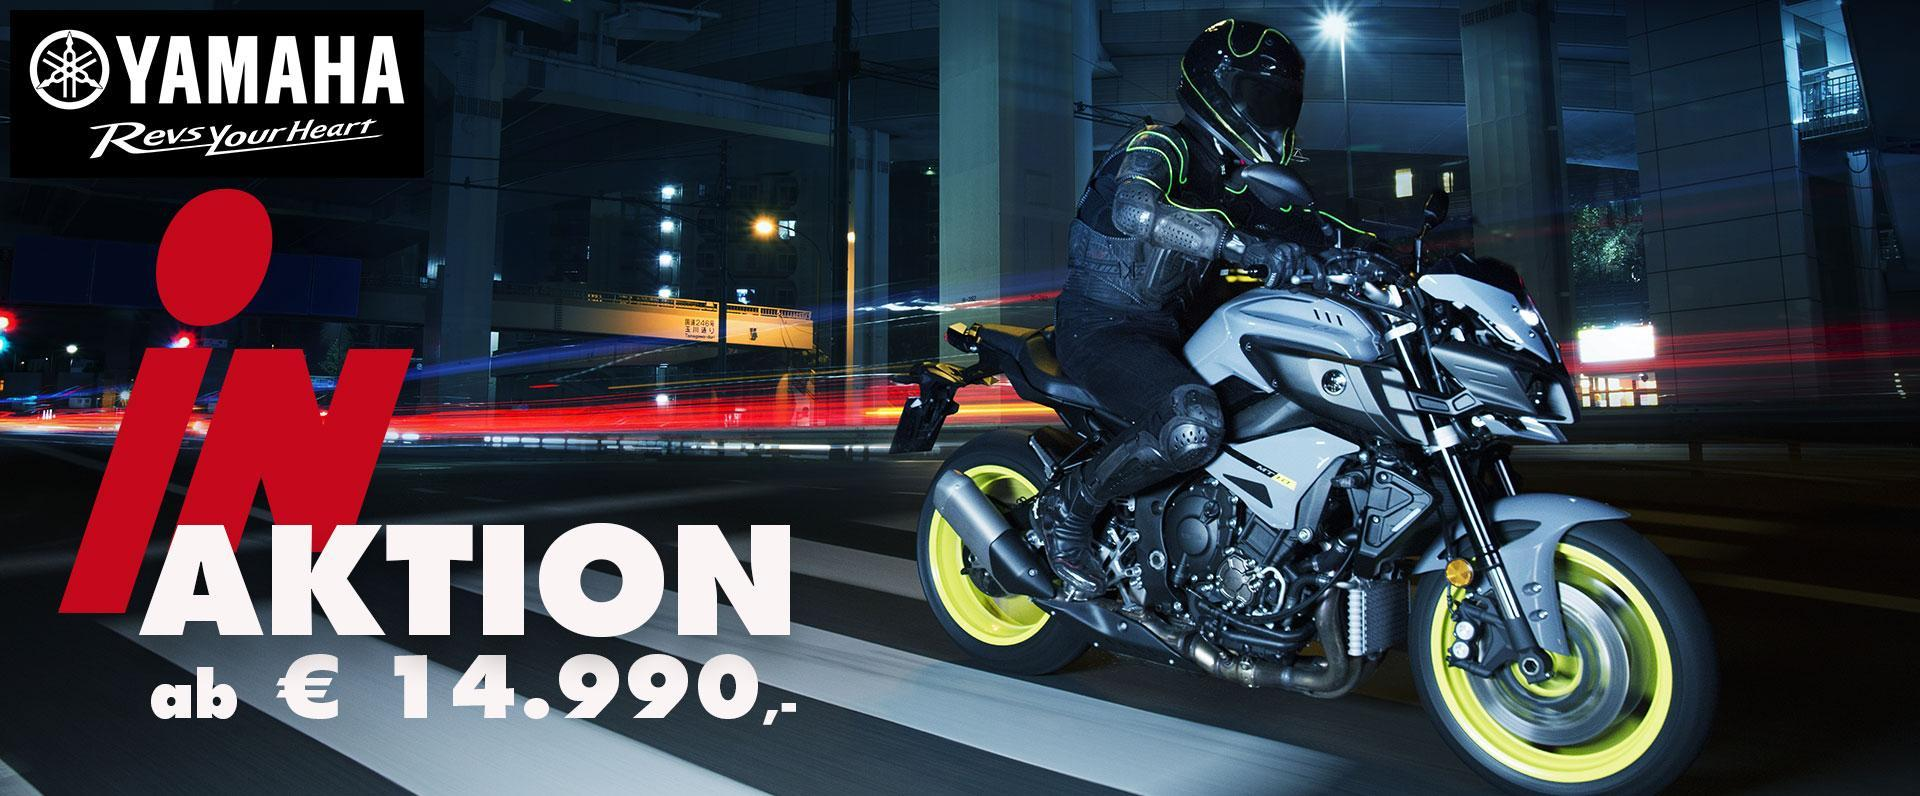 Zweirad Ginzinger Yamaha Aktion jetzt bei uns ab 14.990,--